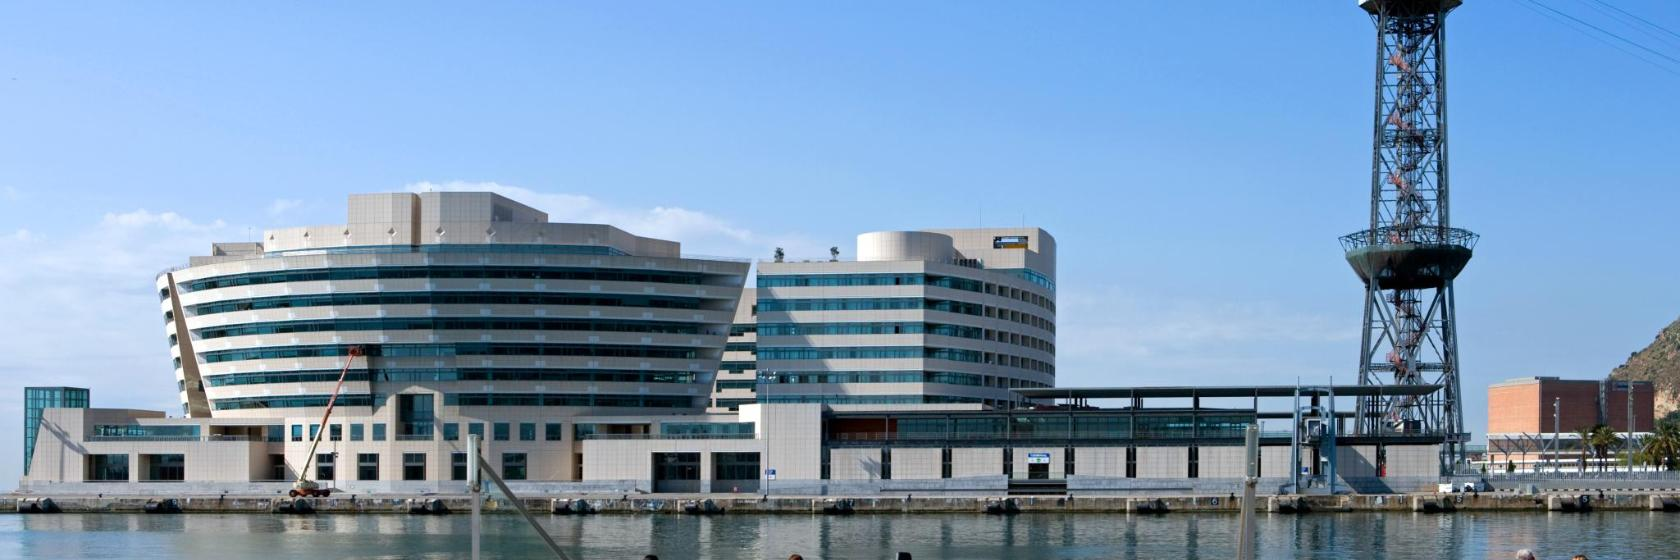 Los 10 mejores hoteles cerca de World Trade Center Barcelona ...